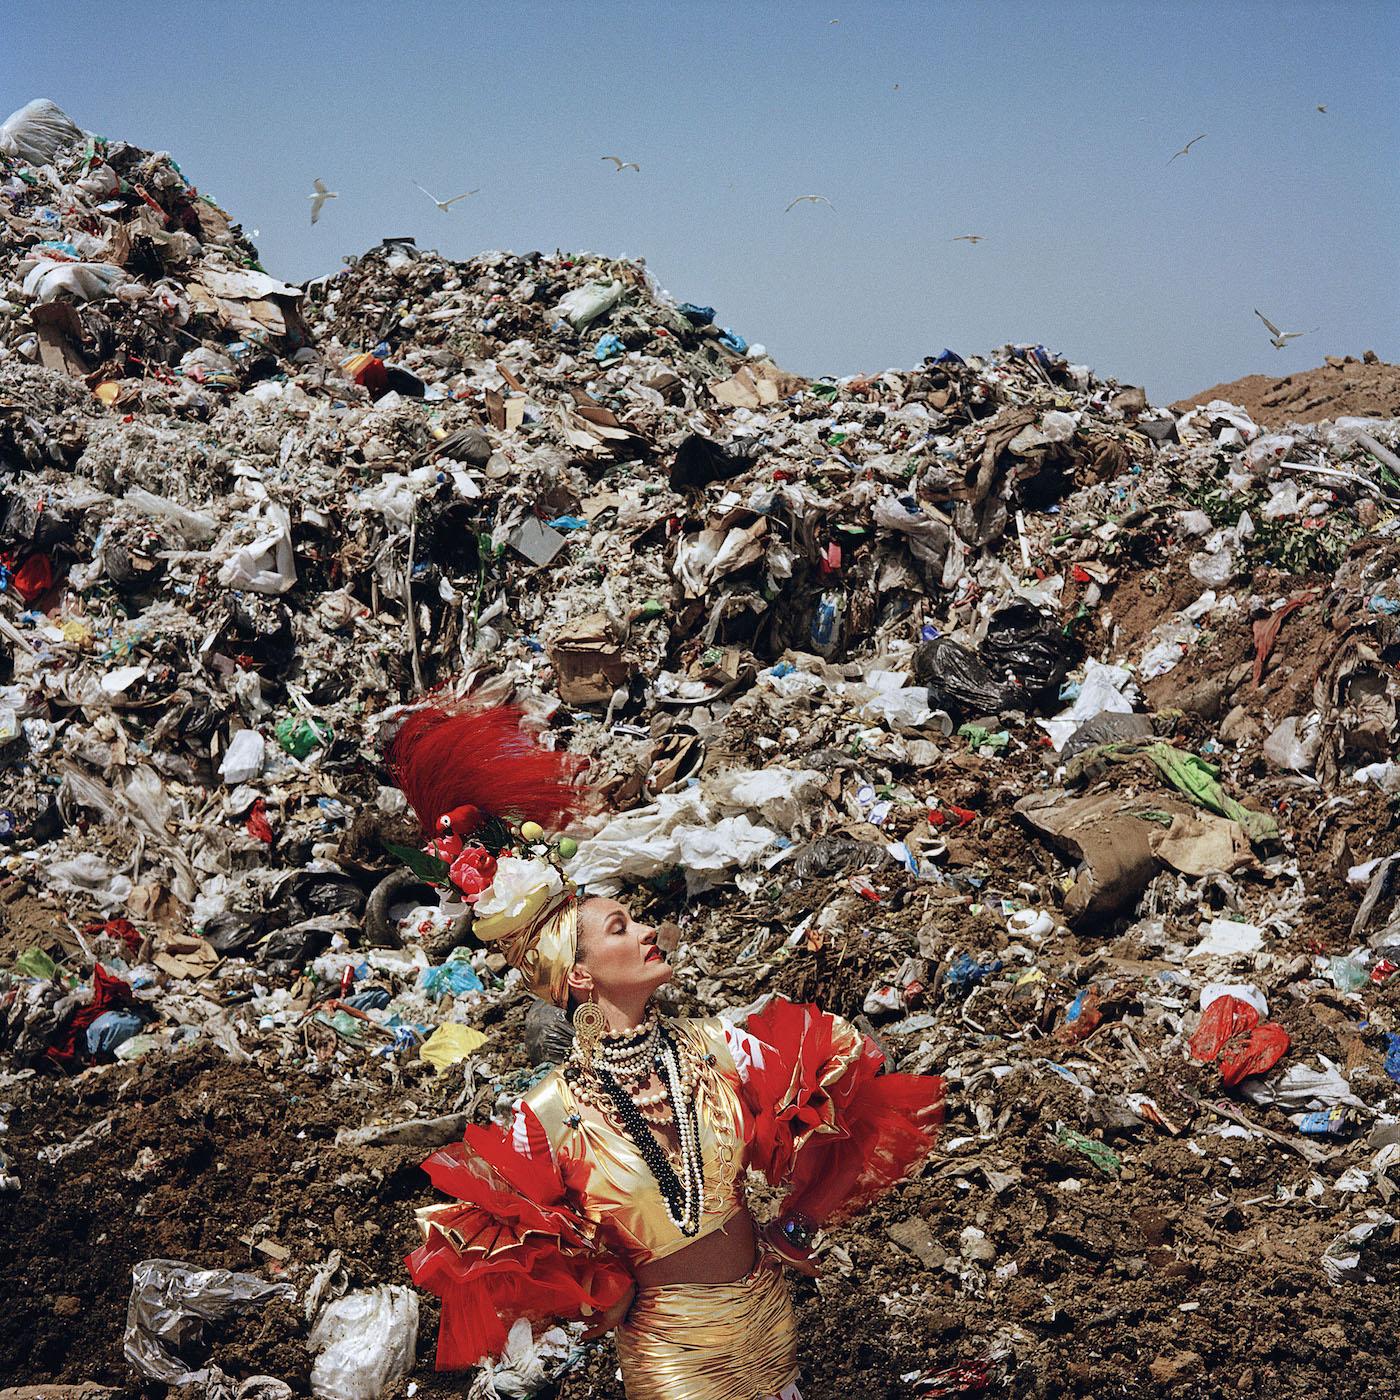 Goldschmied & Chiari, Dump Queen, 2008,  video. Mythologies, Palazzo Palmieri, Monopoli.